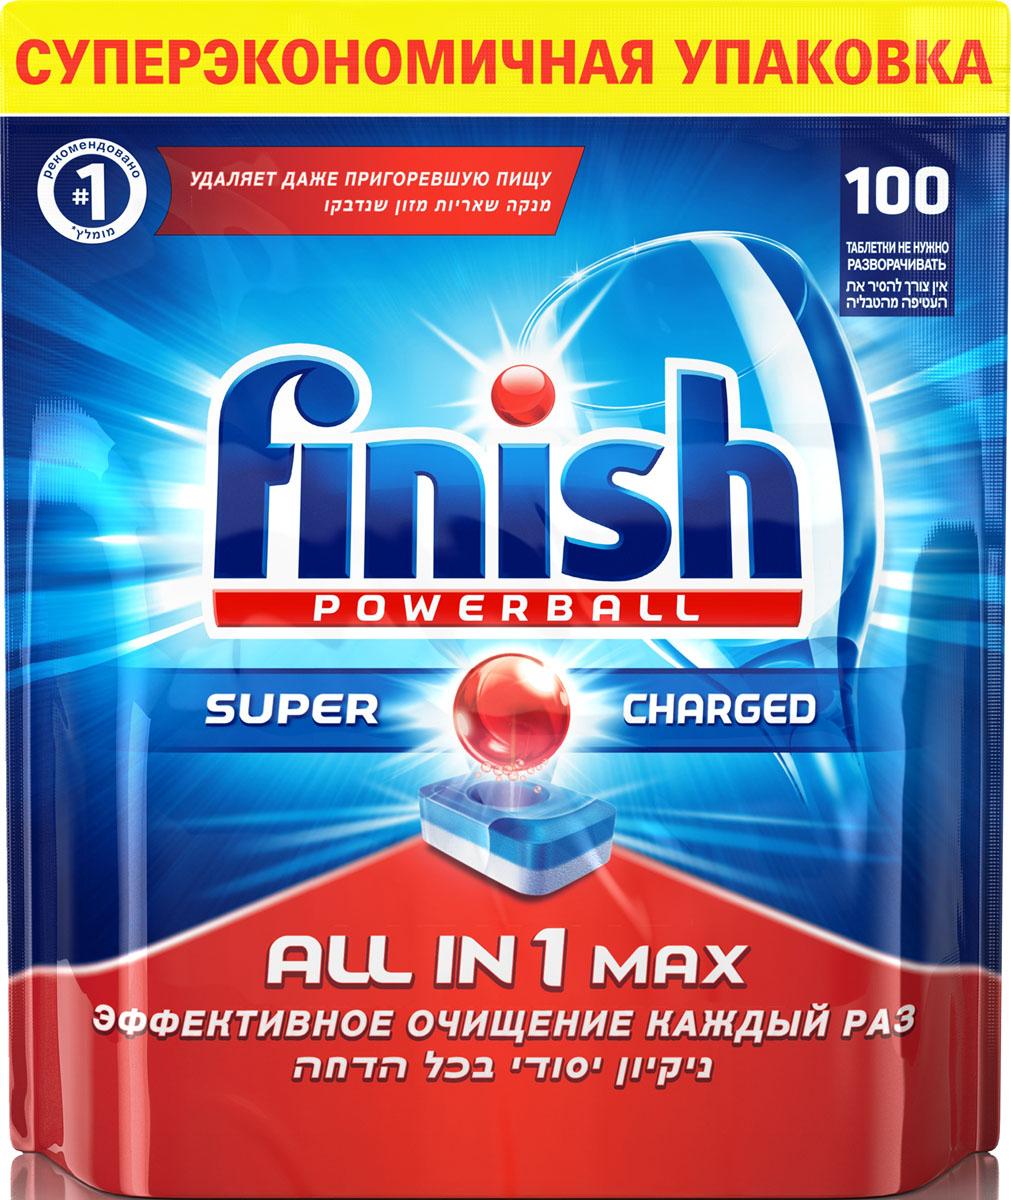 Таблетки для посудомоечной машины Finish Powerball All in 1 Max, 100 шт моющее средство для посудомоечной машины finish all in 1 max power pure 25табл